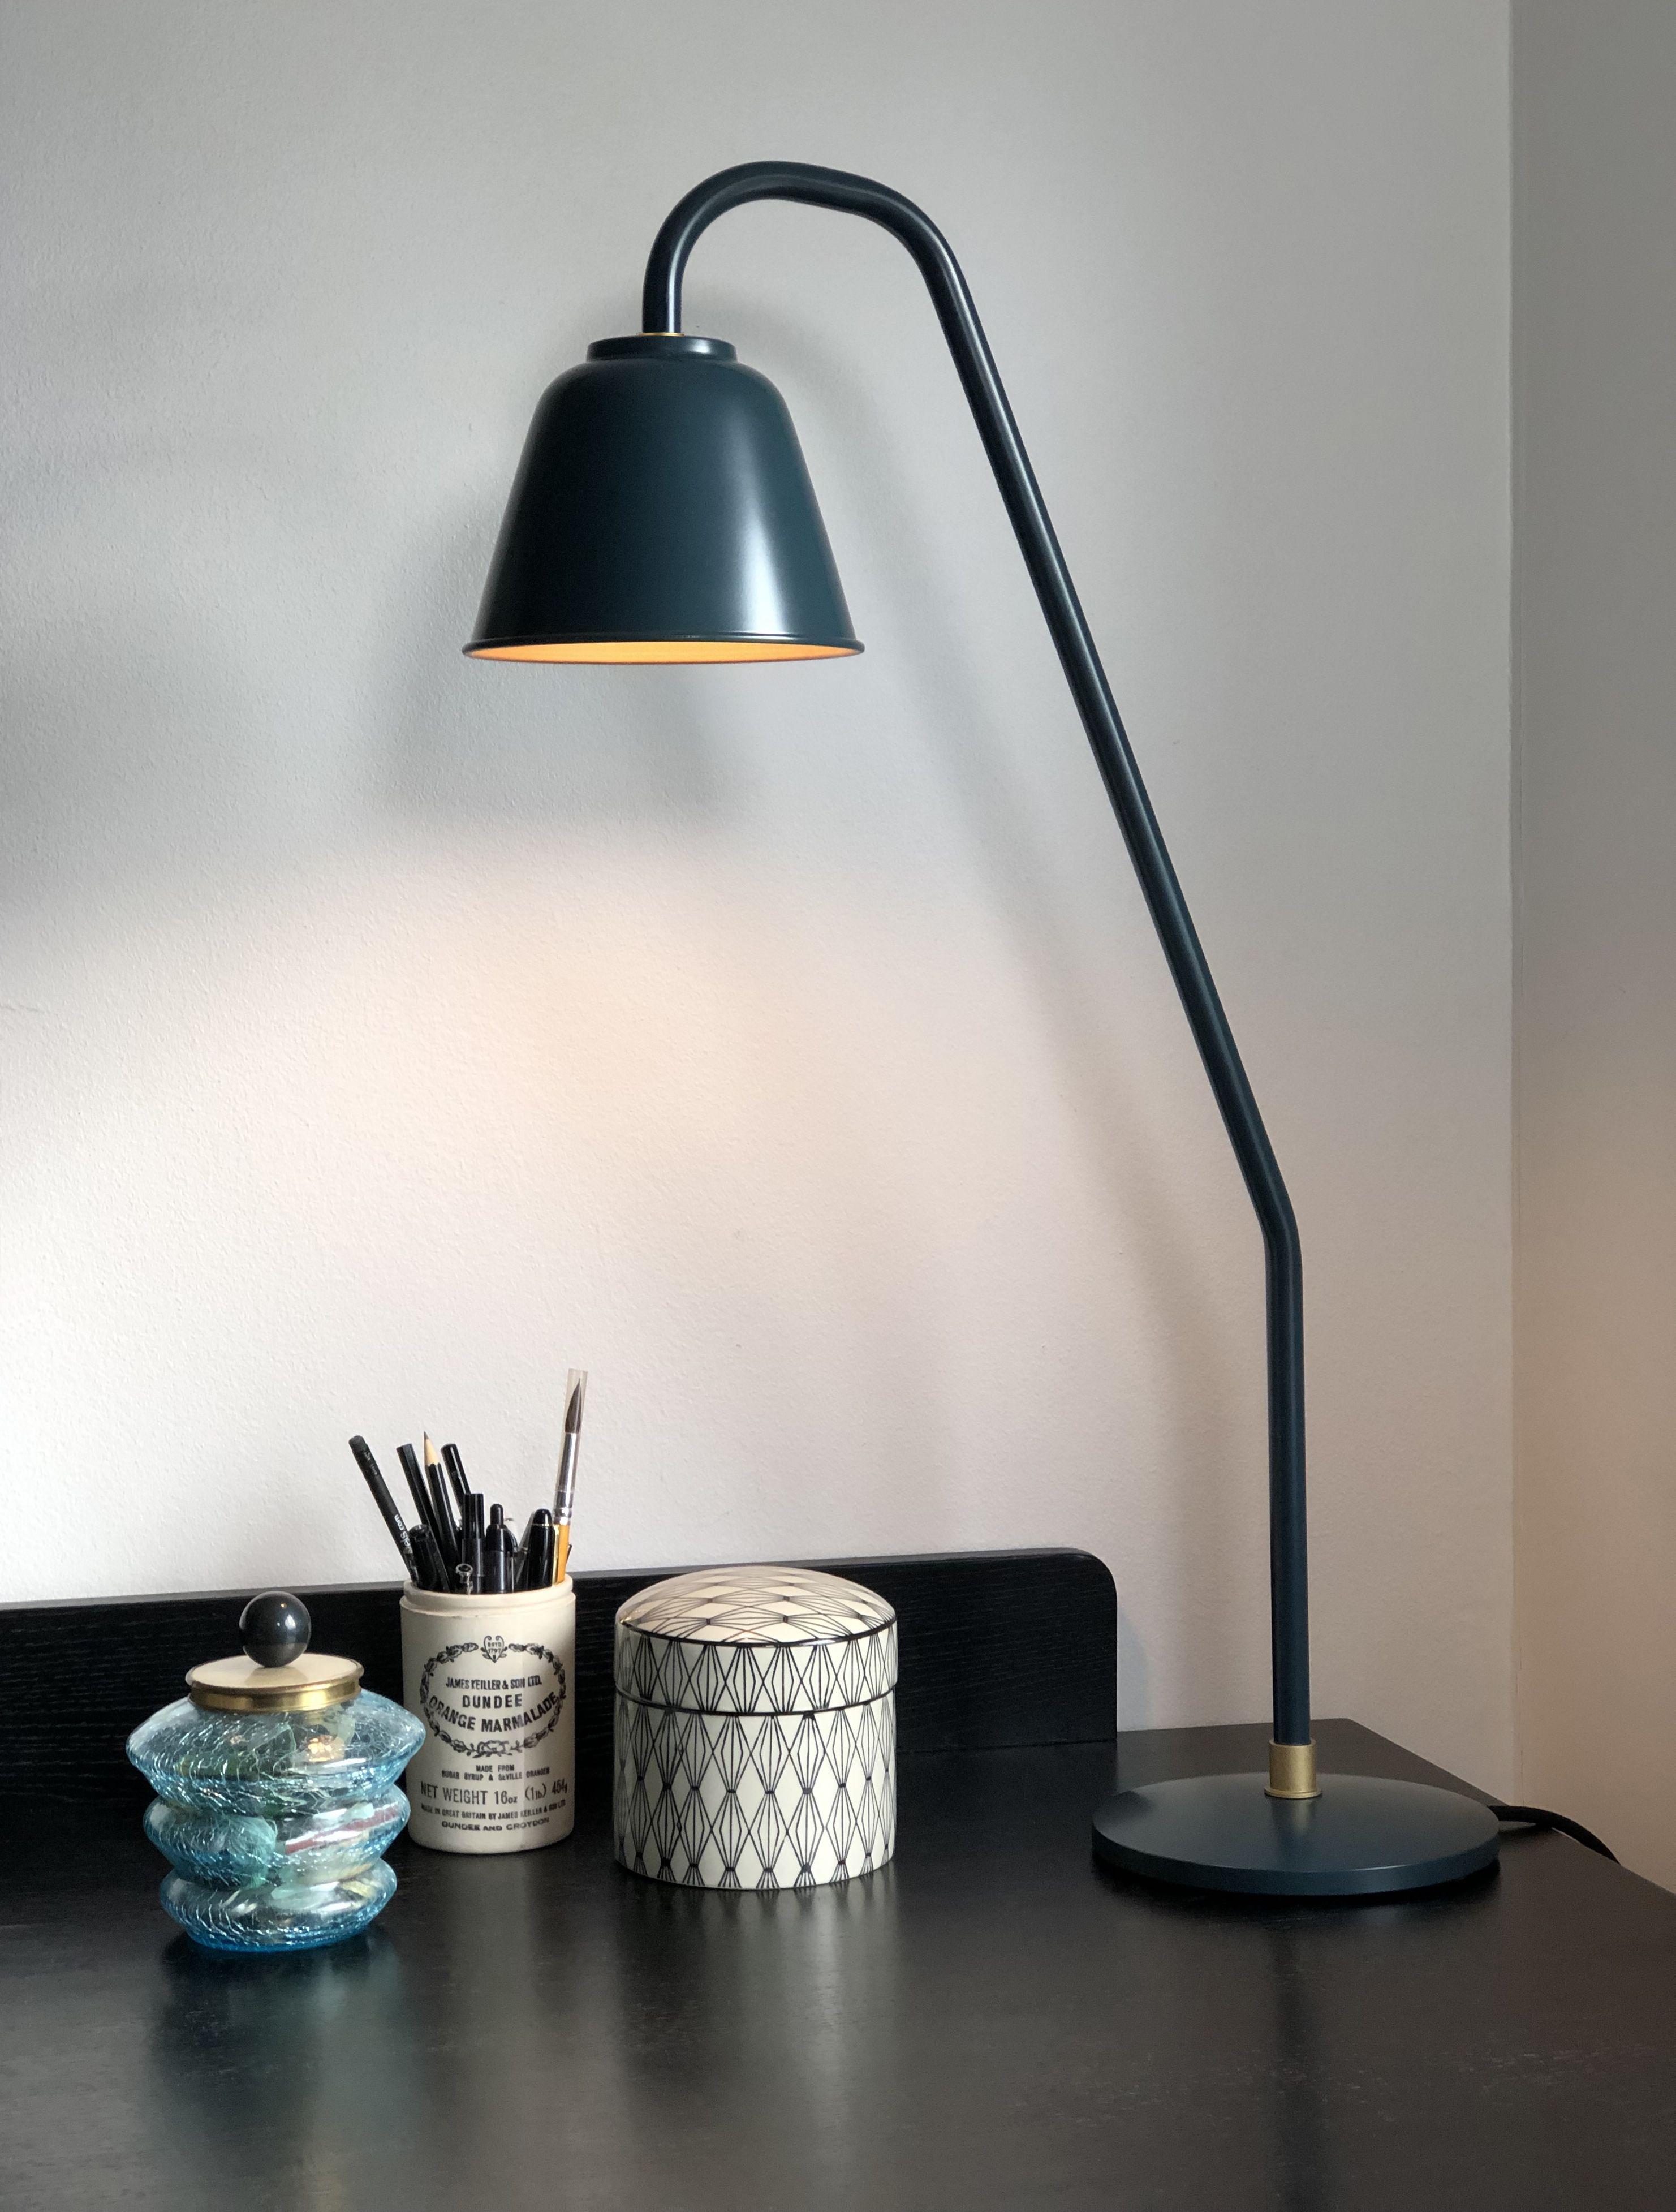 Webster Table And Floor Lamp Lamp Design Modern Scandinavian Design Danish Design